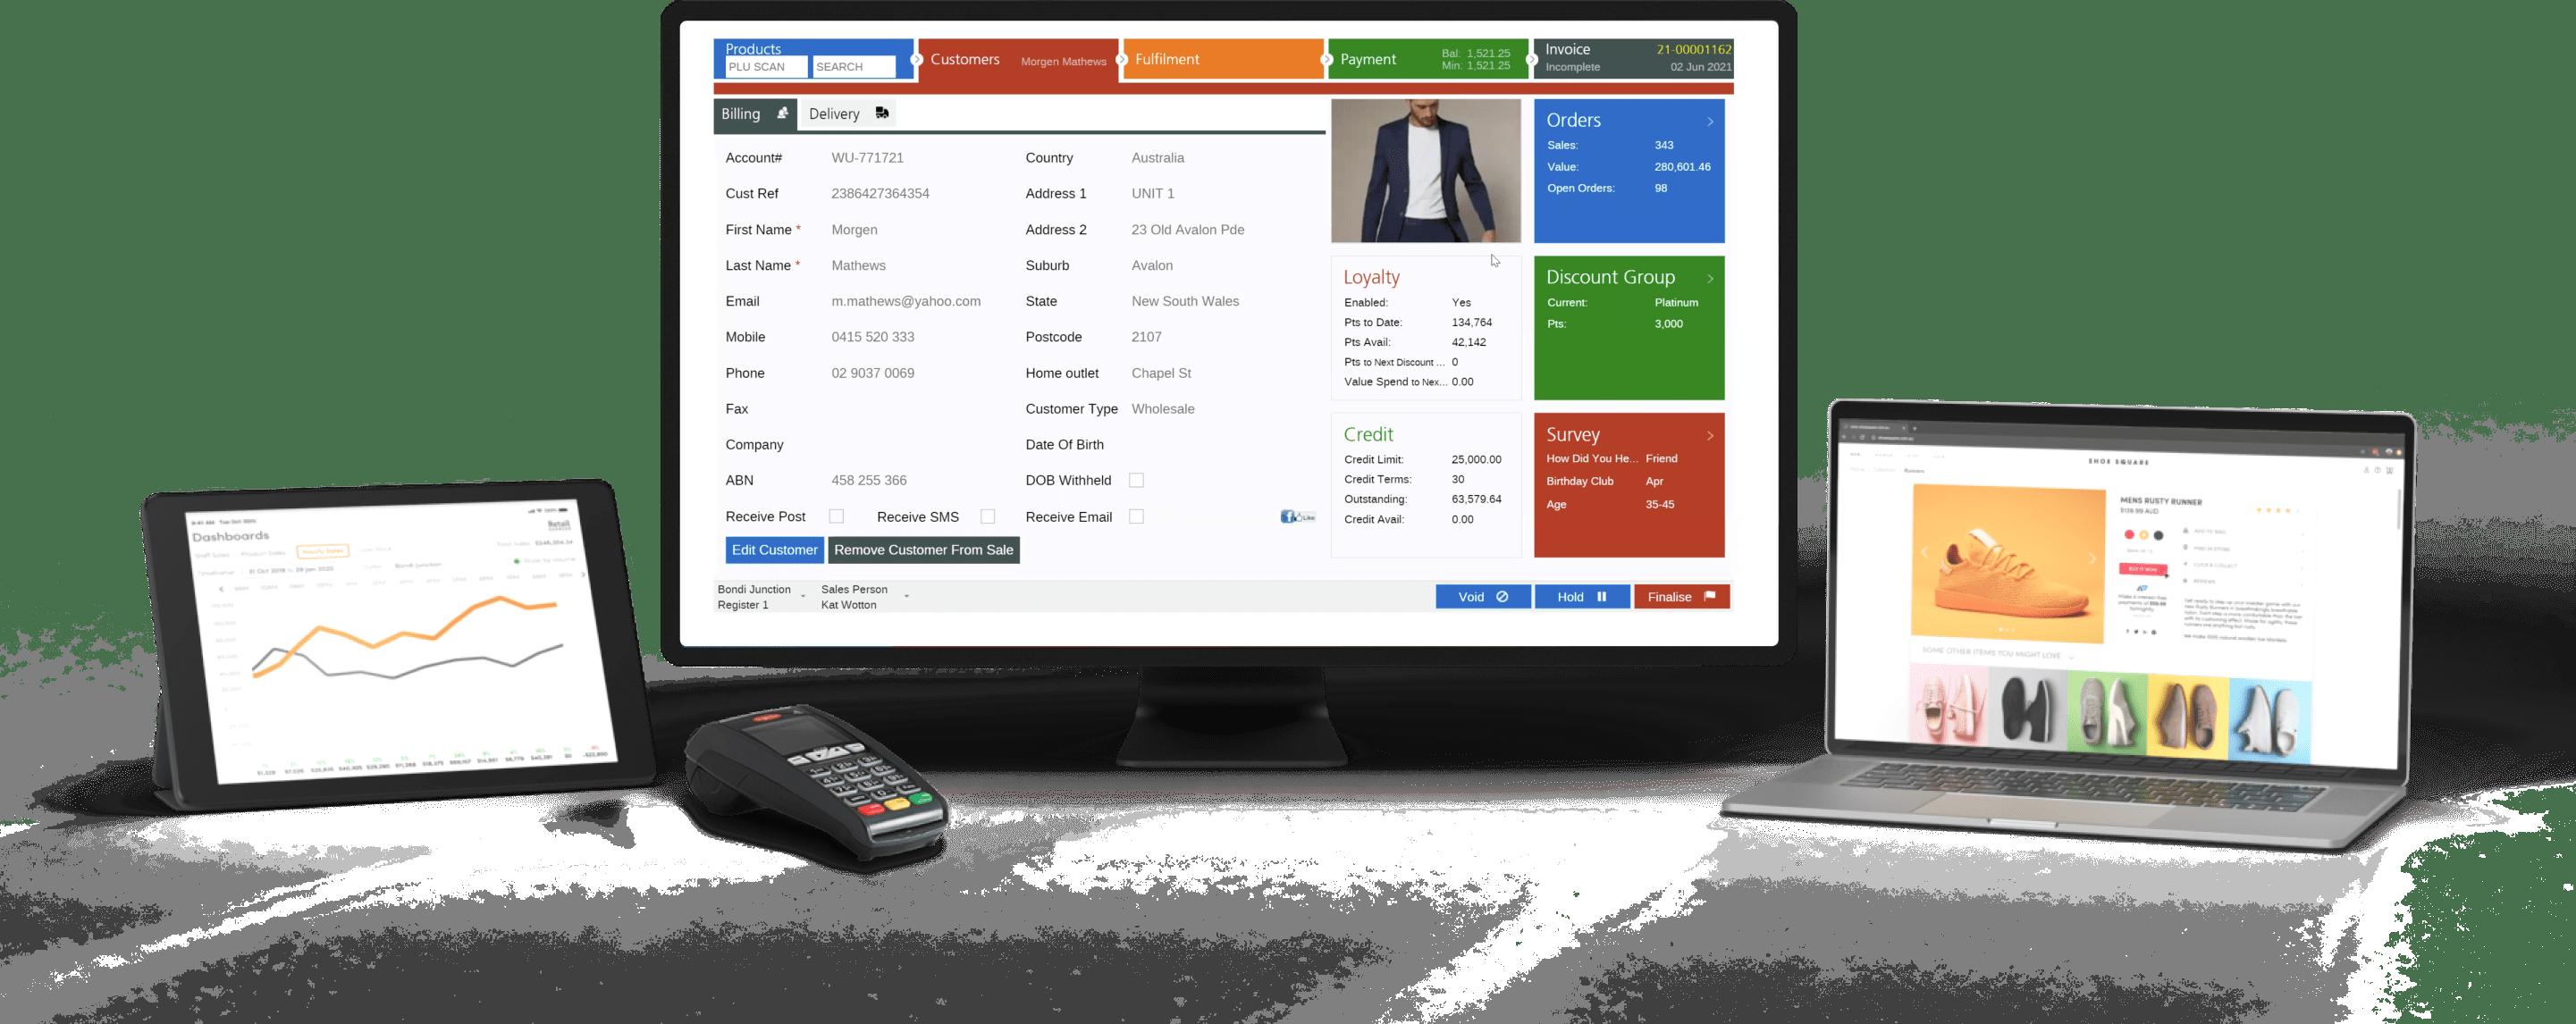 Retail Express Software - 1